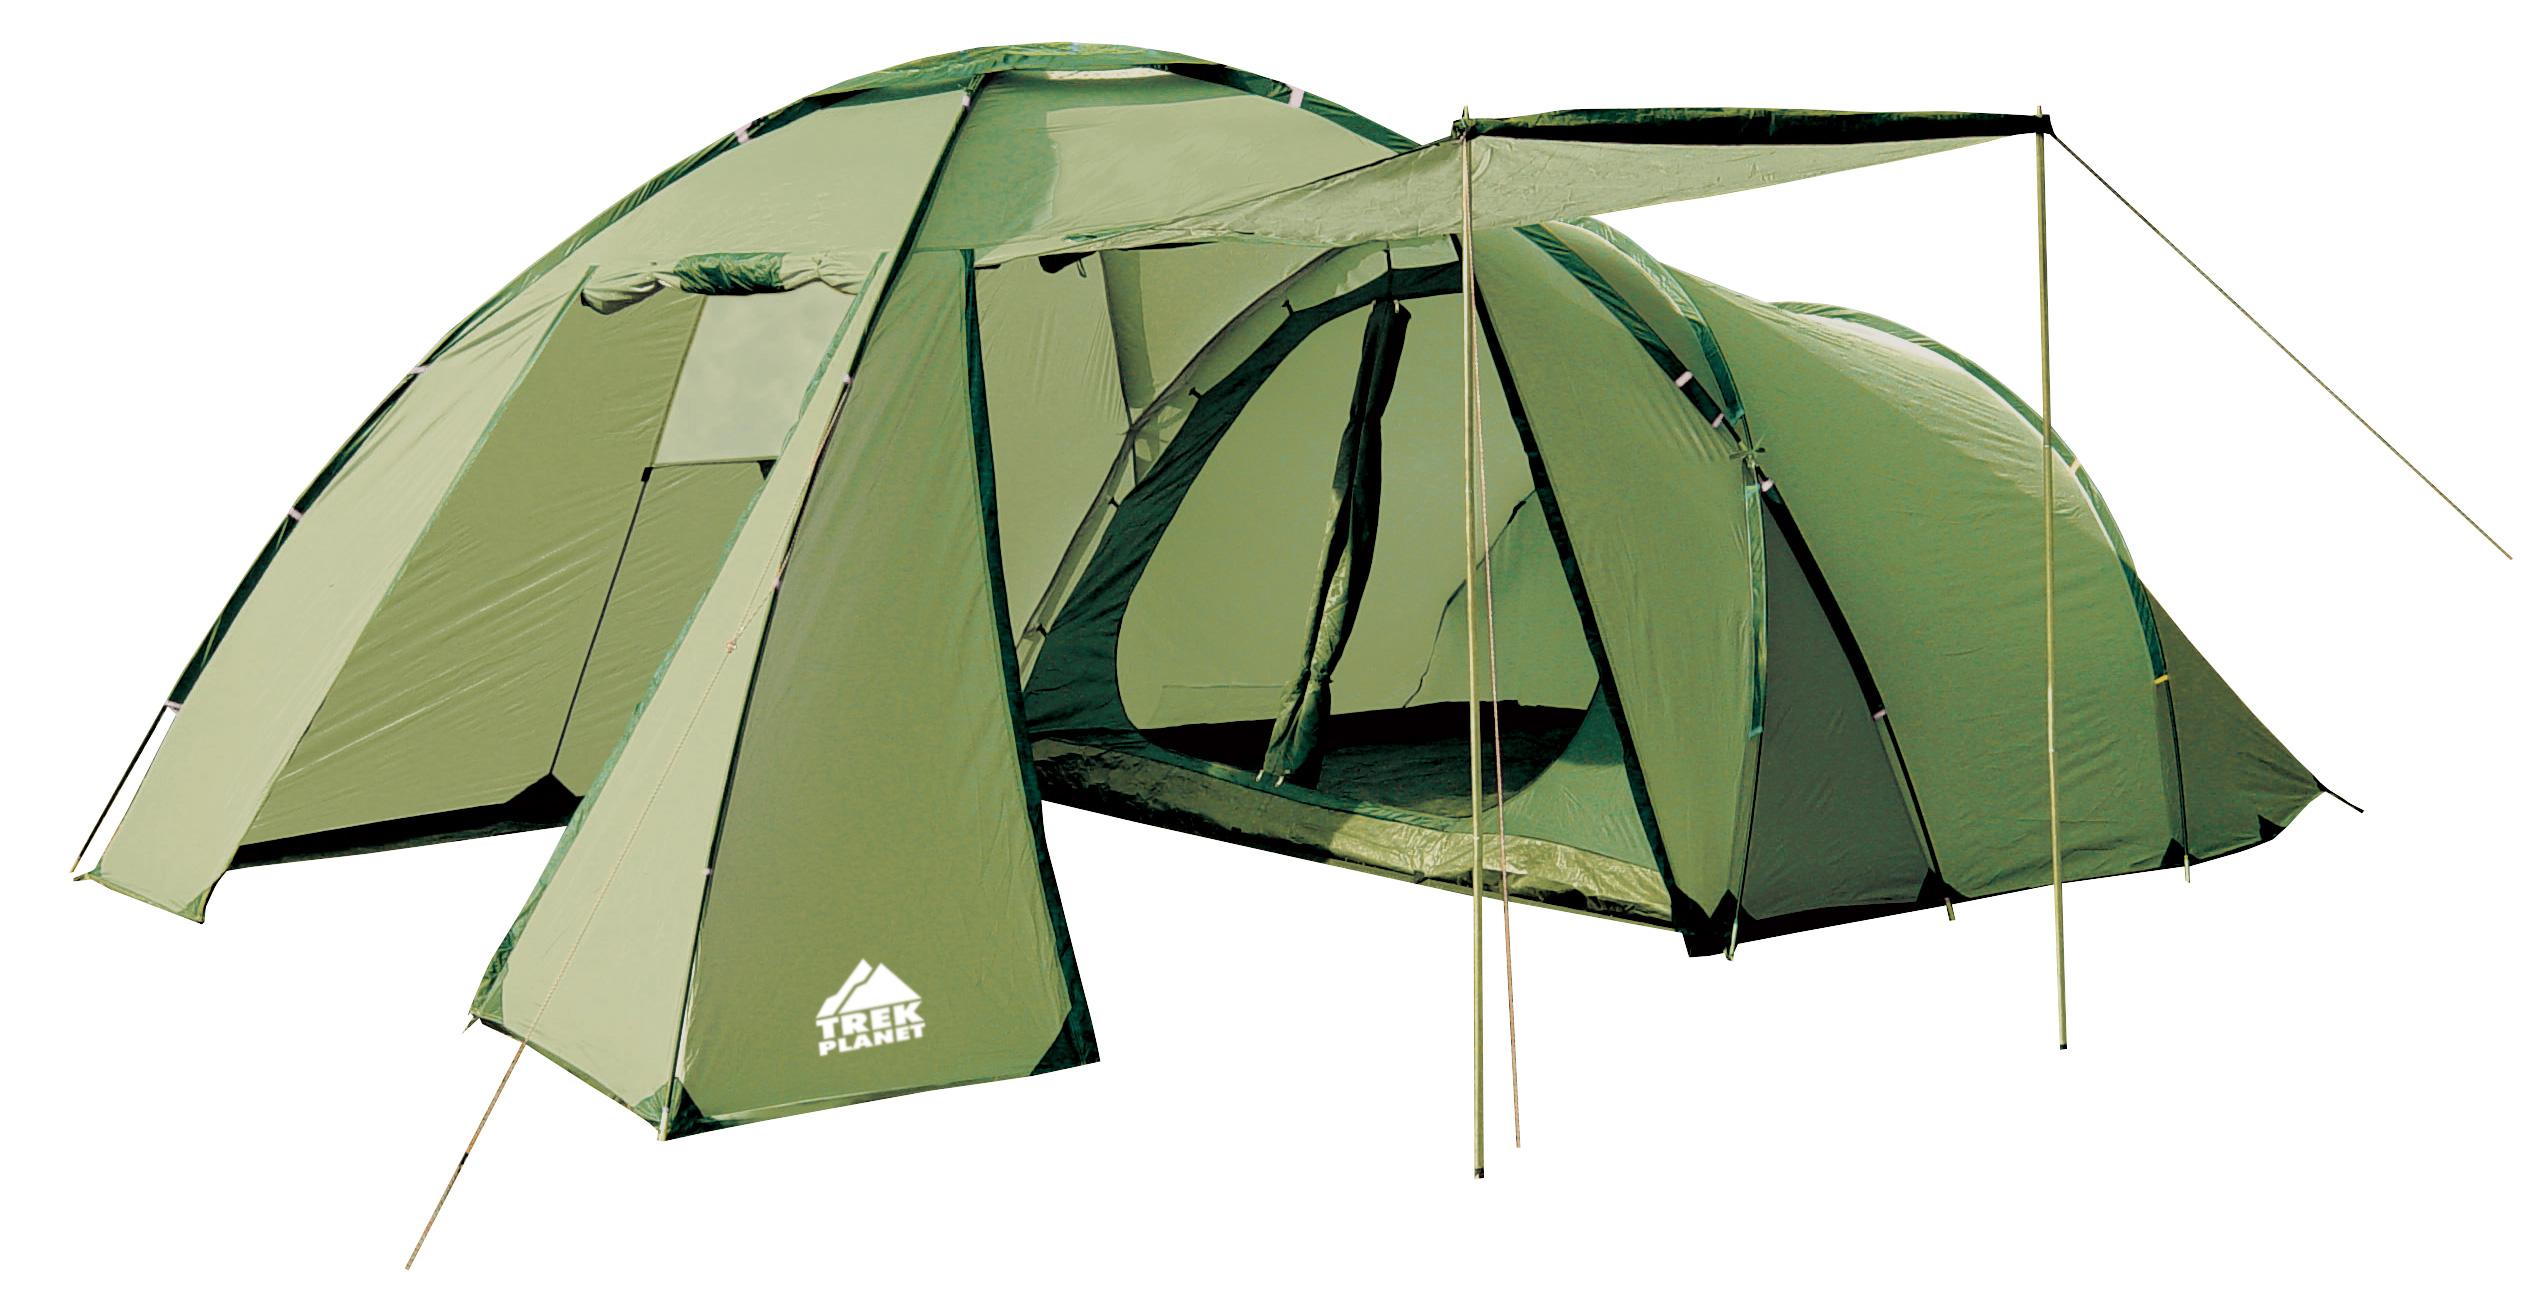 Палатка Trek Planet Montana четырехместная зеленая